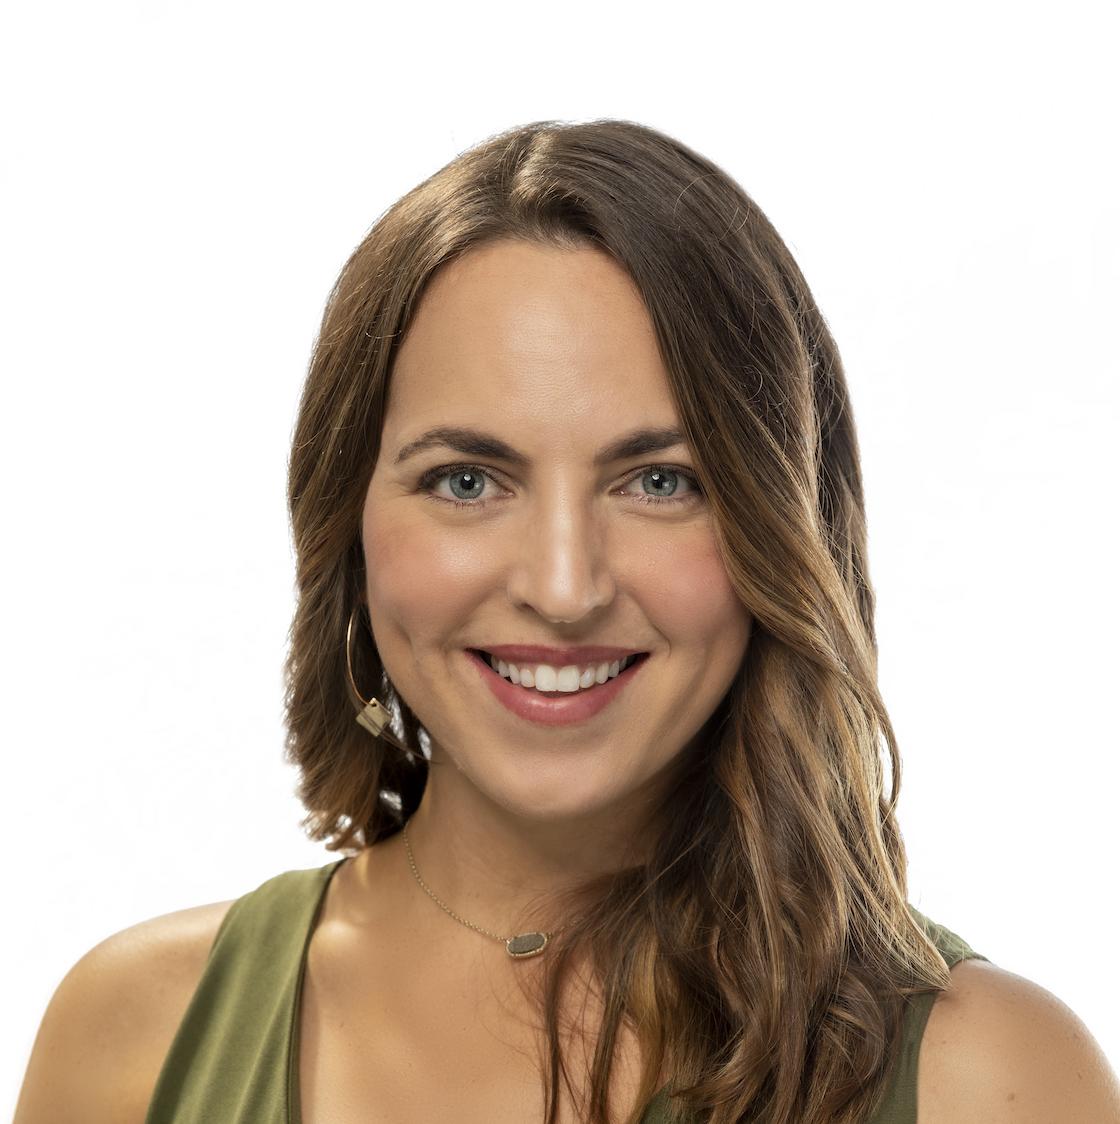 Caitlin Schubert